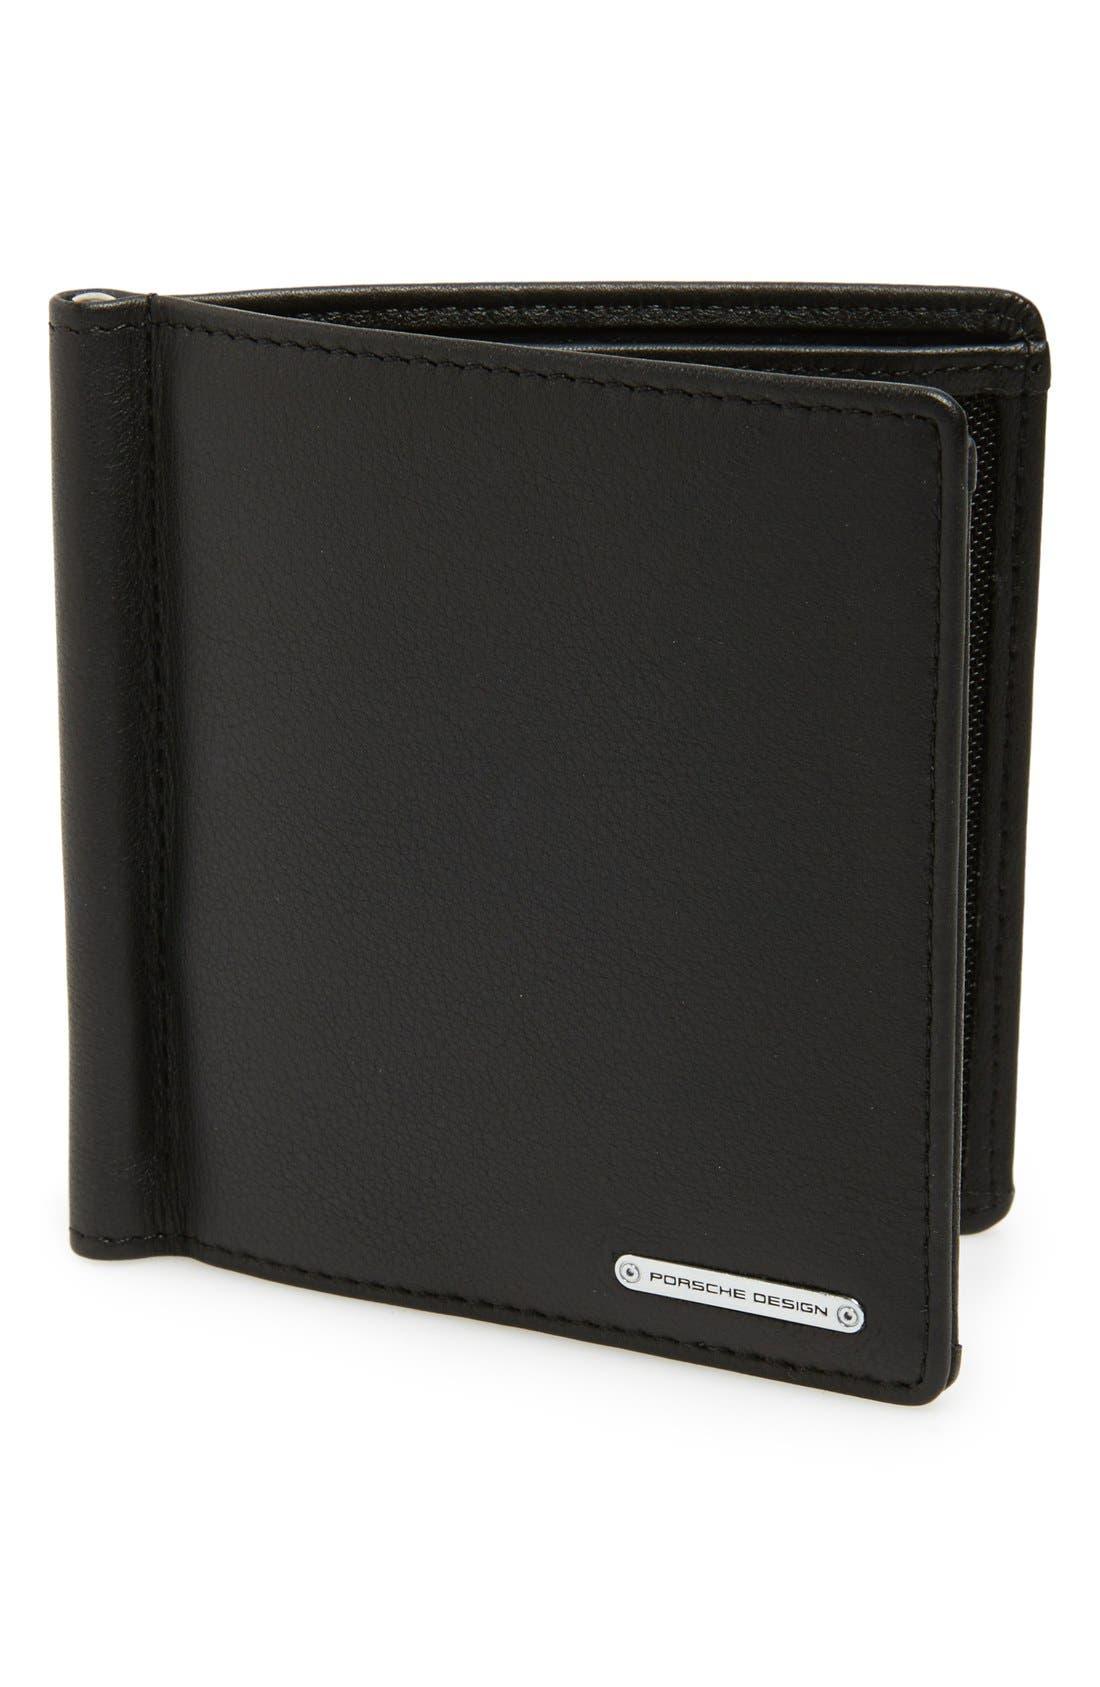 'CL2 2.0' Money Clip Card Holder,                             Main thumbnail 1, color,                             Black